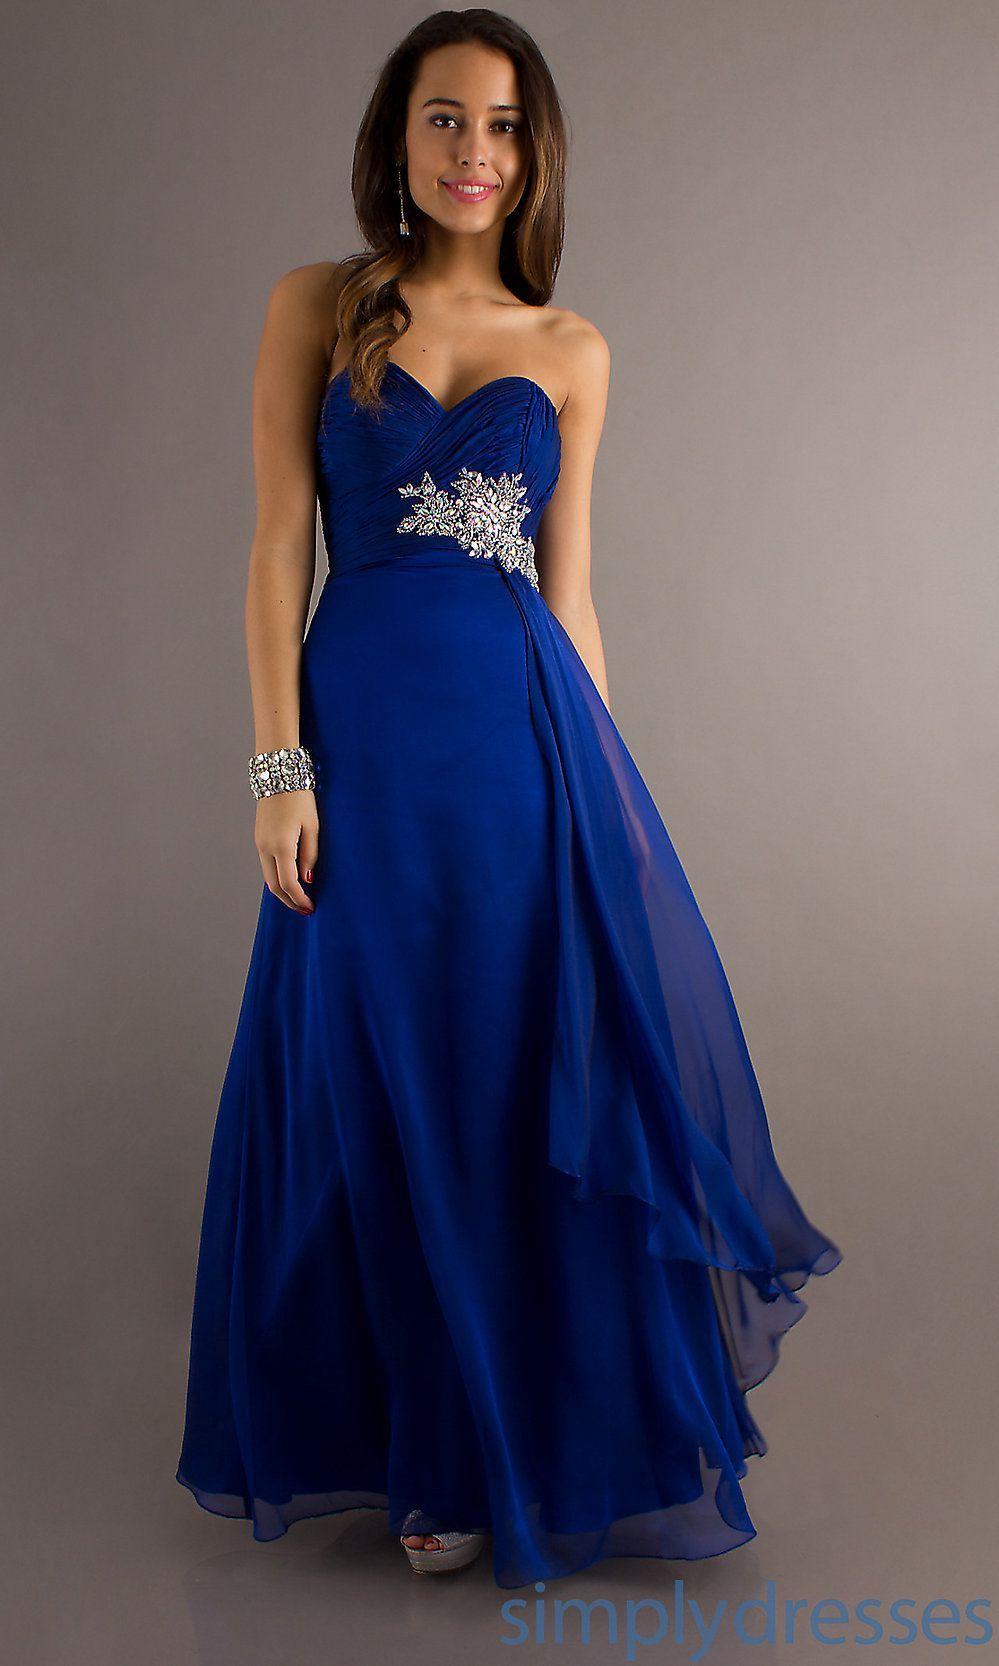 20++ Royal blue dress for wedding ideas in 2021